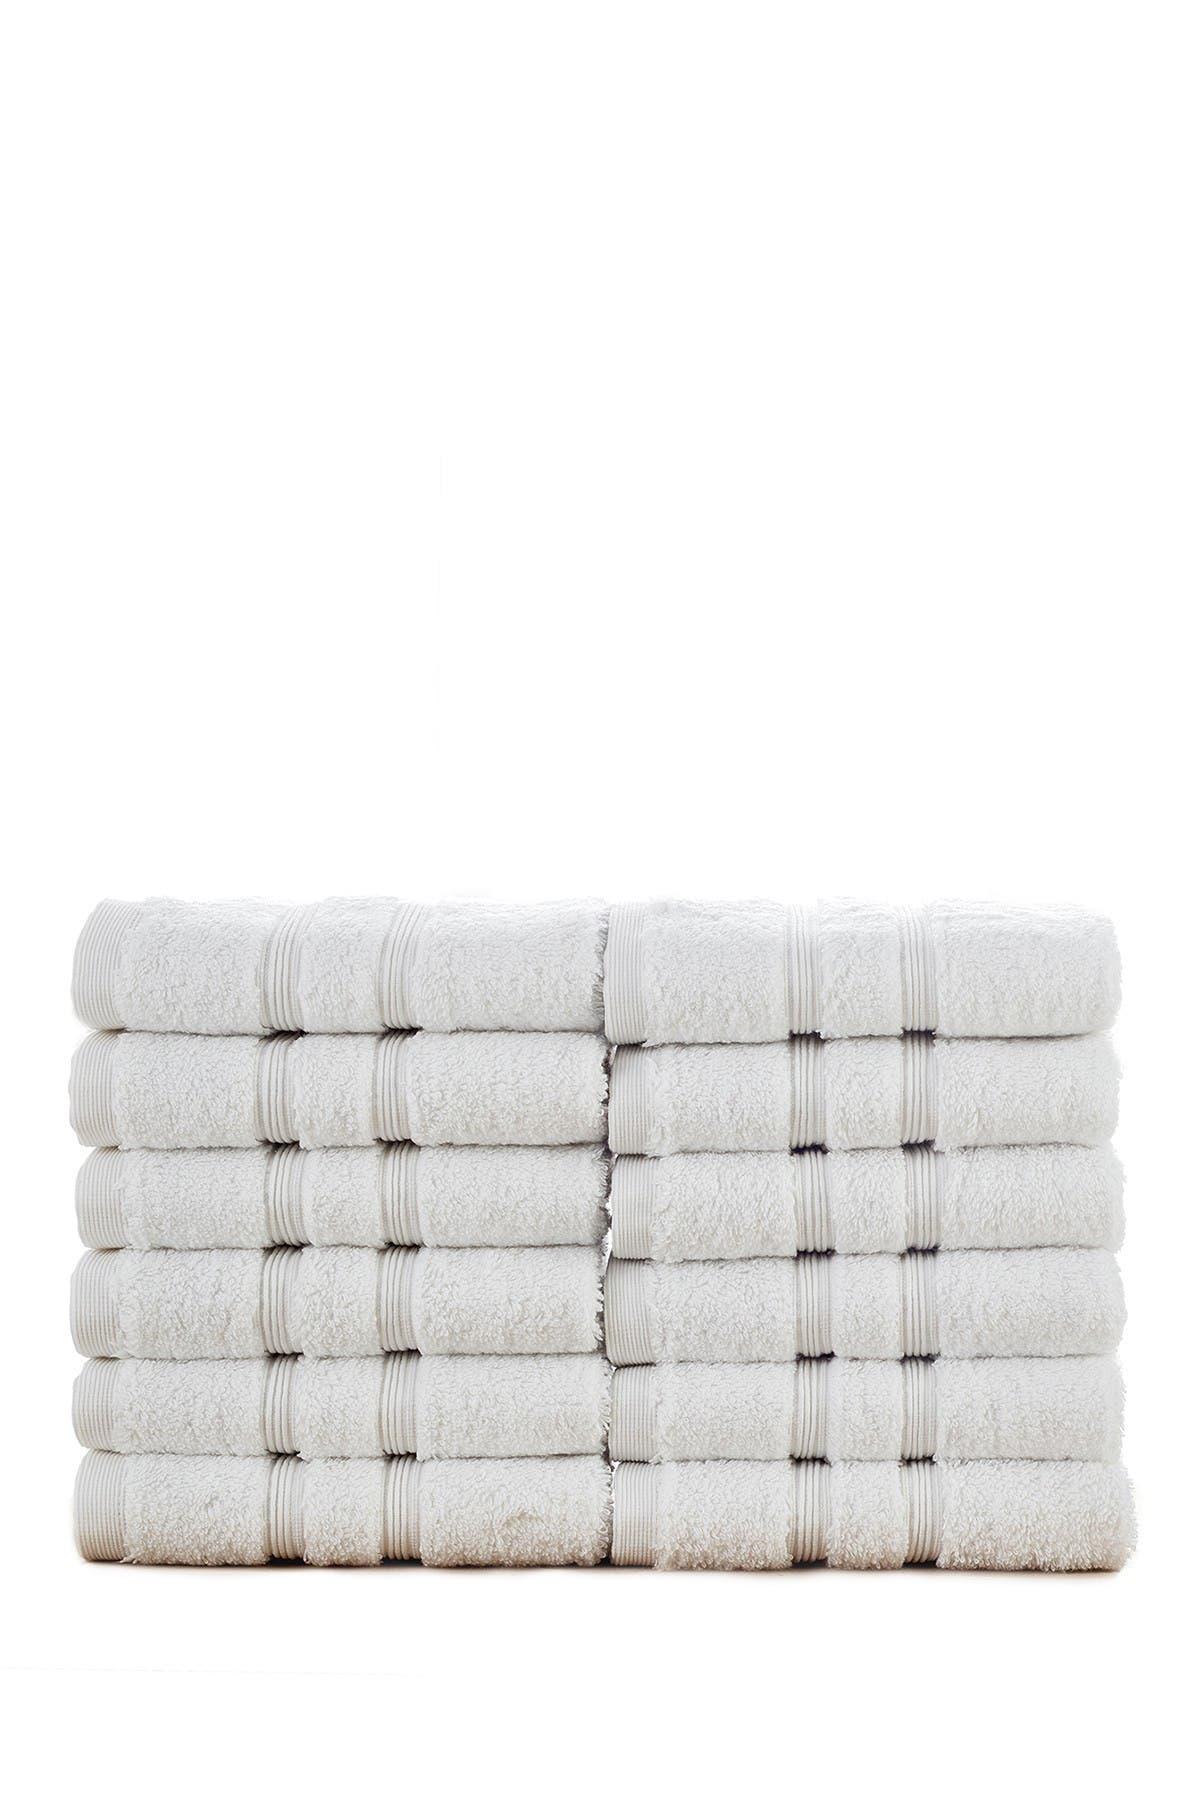 Image of Modern Threads Manor Ridge Turkish Cotton 700 GSM Wash Cloth - Set of 12 - White